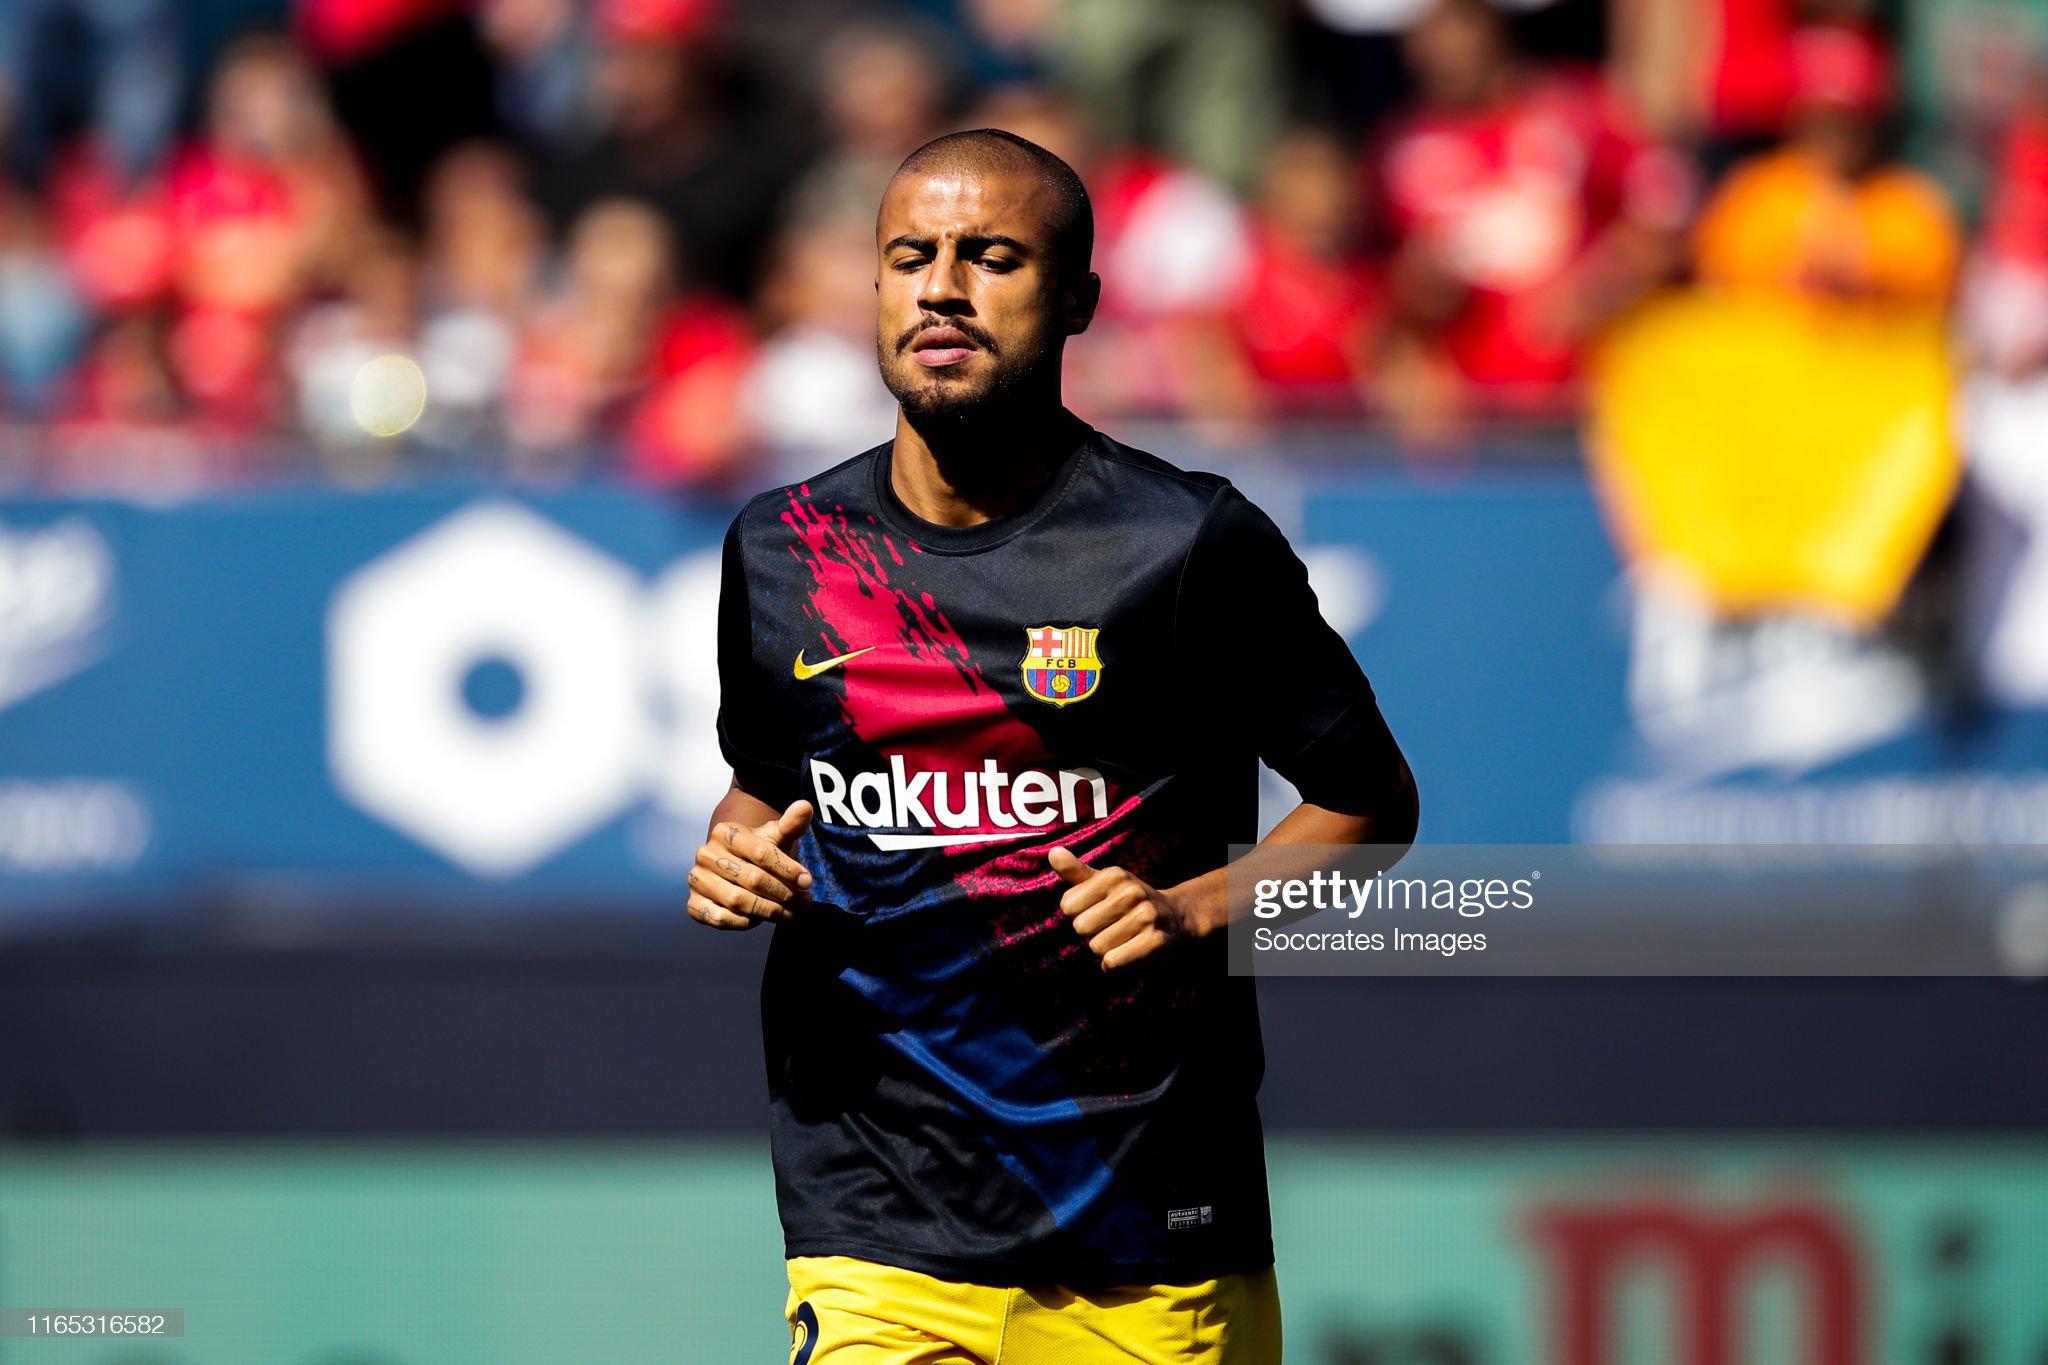 صور مباراة : أوساسونا - برشلونة 2-2 ( 31-08-2019 )  Rafinha-of-fc-barcelona-during-the-la-liga-santander-match-between-v-picture-id1165316582?s=2048x2048